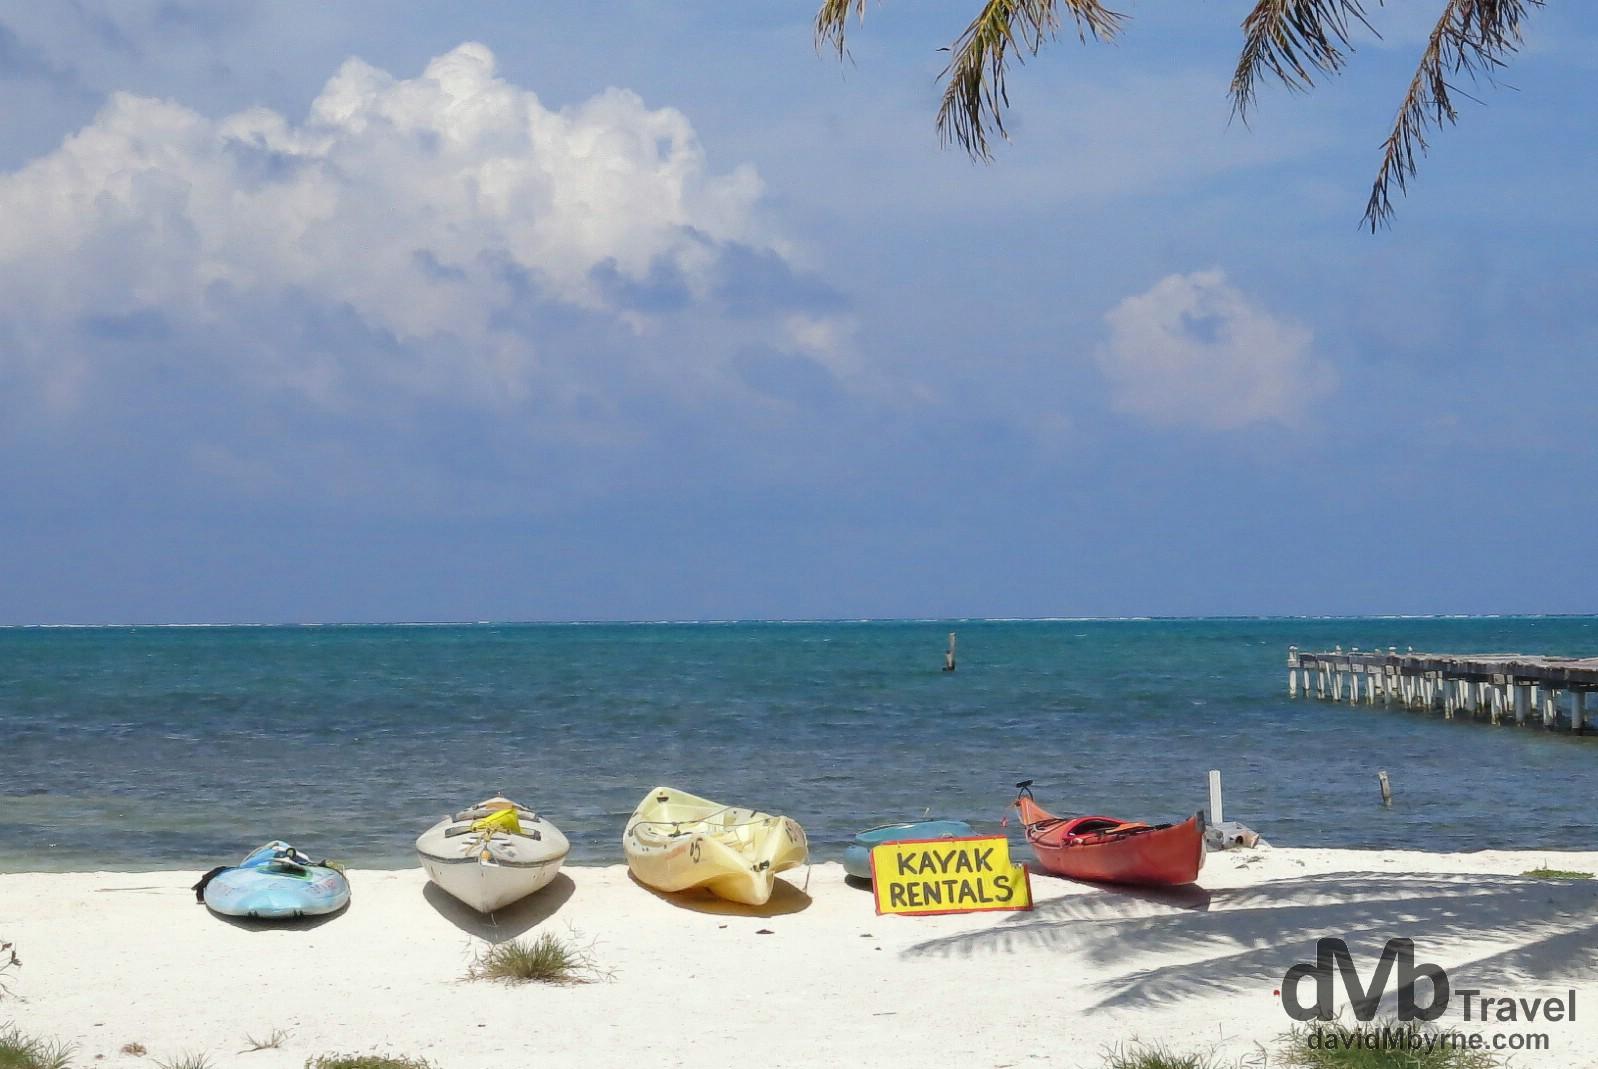 Kayaks, Caye Caulker, Belize. May 13th 2013.